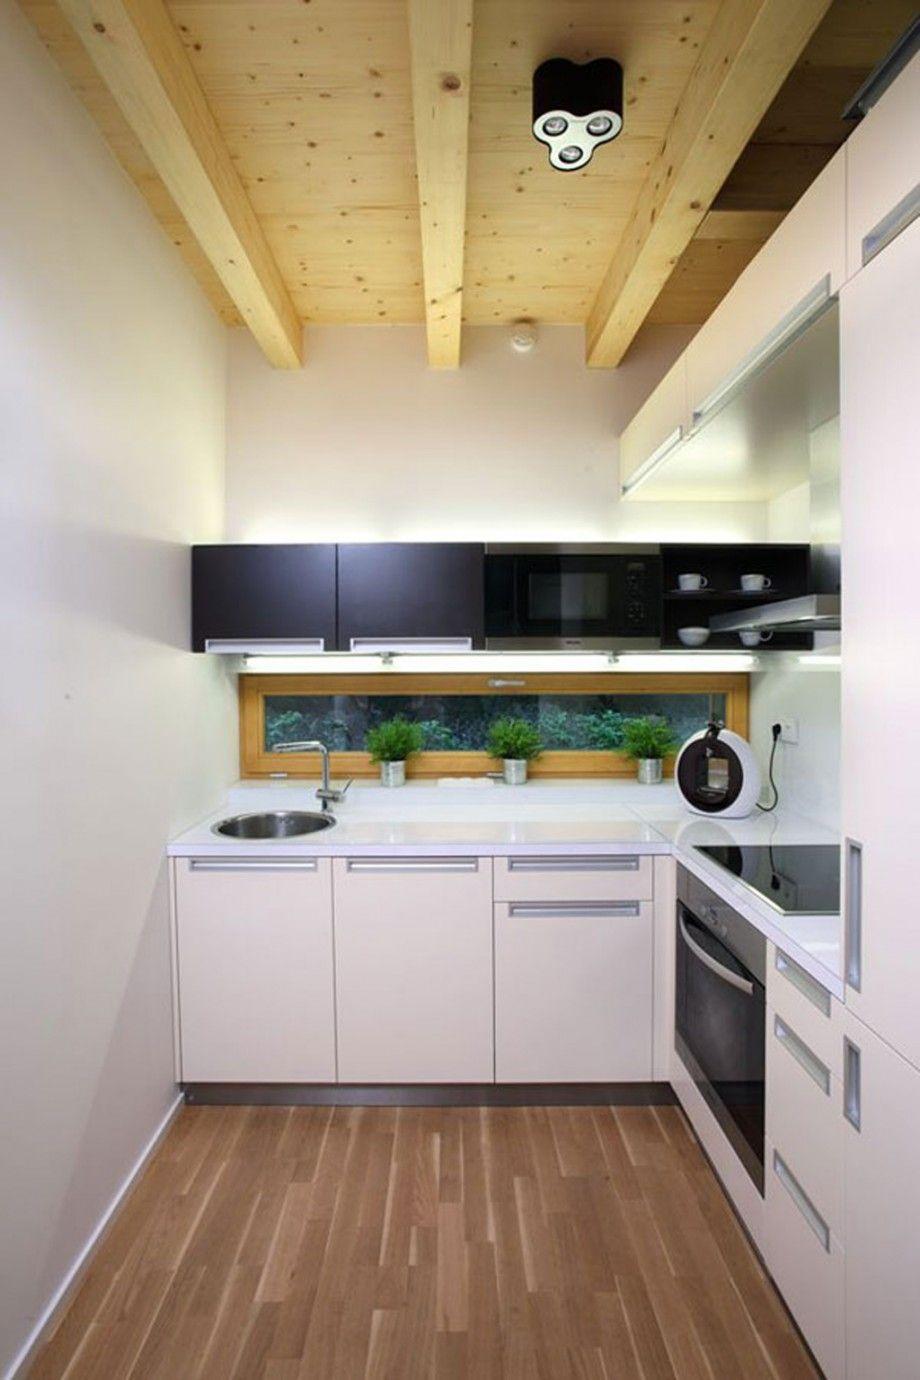 Space Saving Kitchen Decorations Iroonie Saver Ideas For Storage Brilliant Space Saving Kitchen Designs Inspiration Design